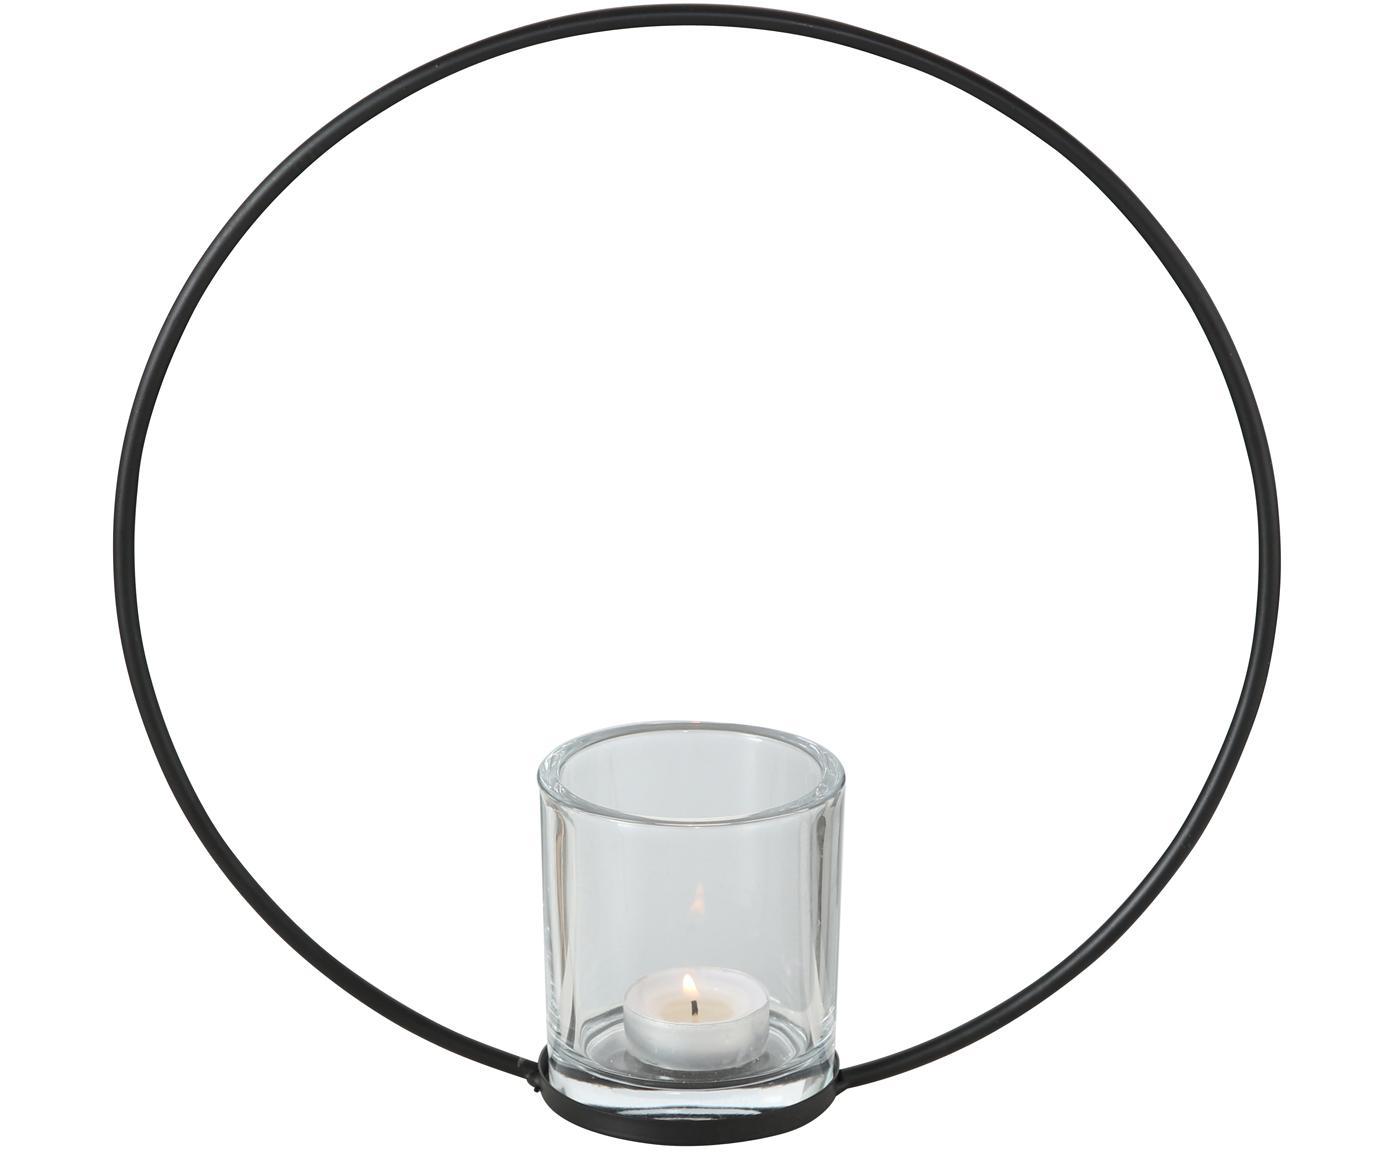 Portavelas Rumba, Metal, vidrio, Negro, Ø 30 x F 8 cm